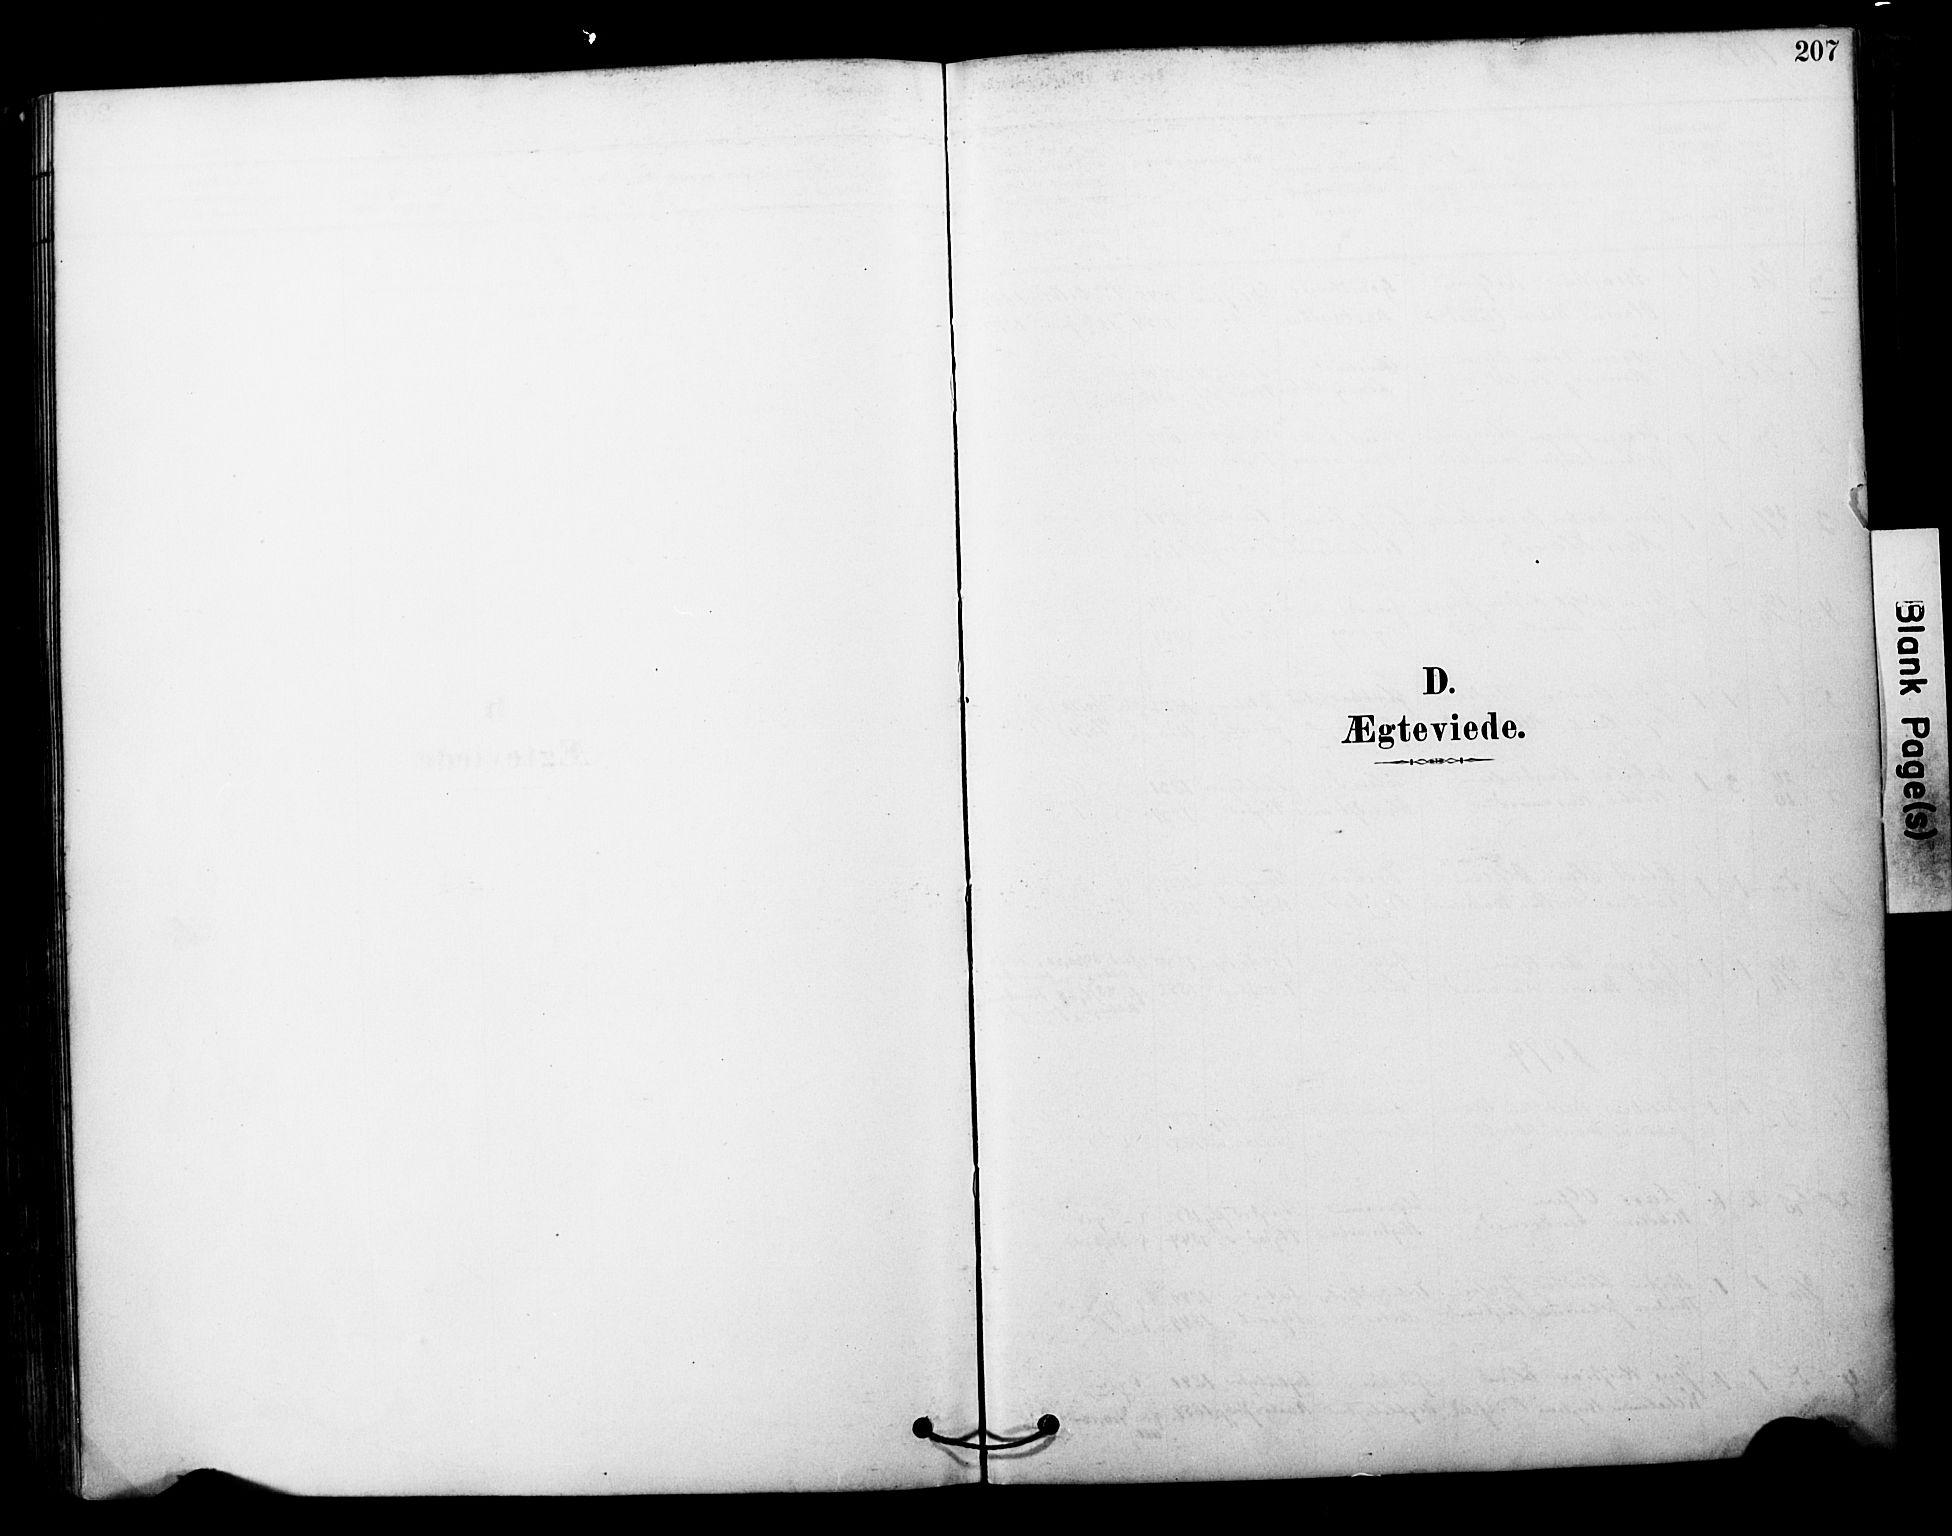 SATØ, Tranøy sokneprestkontor, I/Ia/Iaa/L0011kirke: Ministerialbok nr. 11, 1878-1904, s. 207